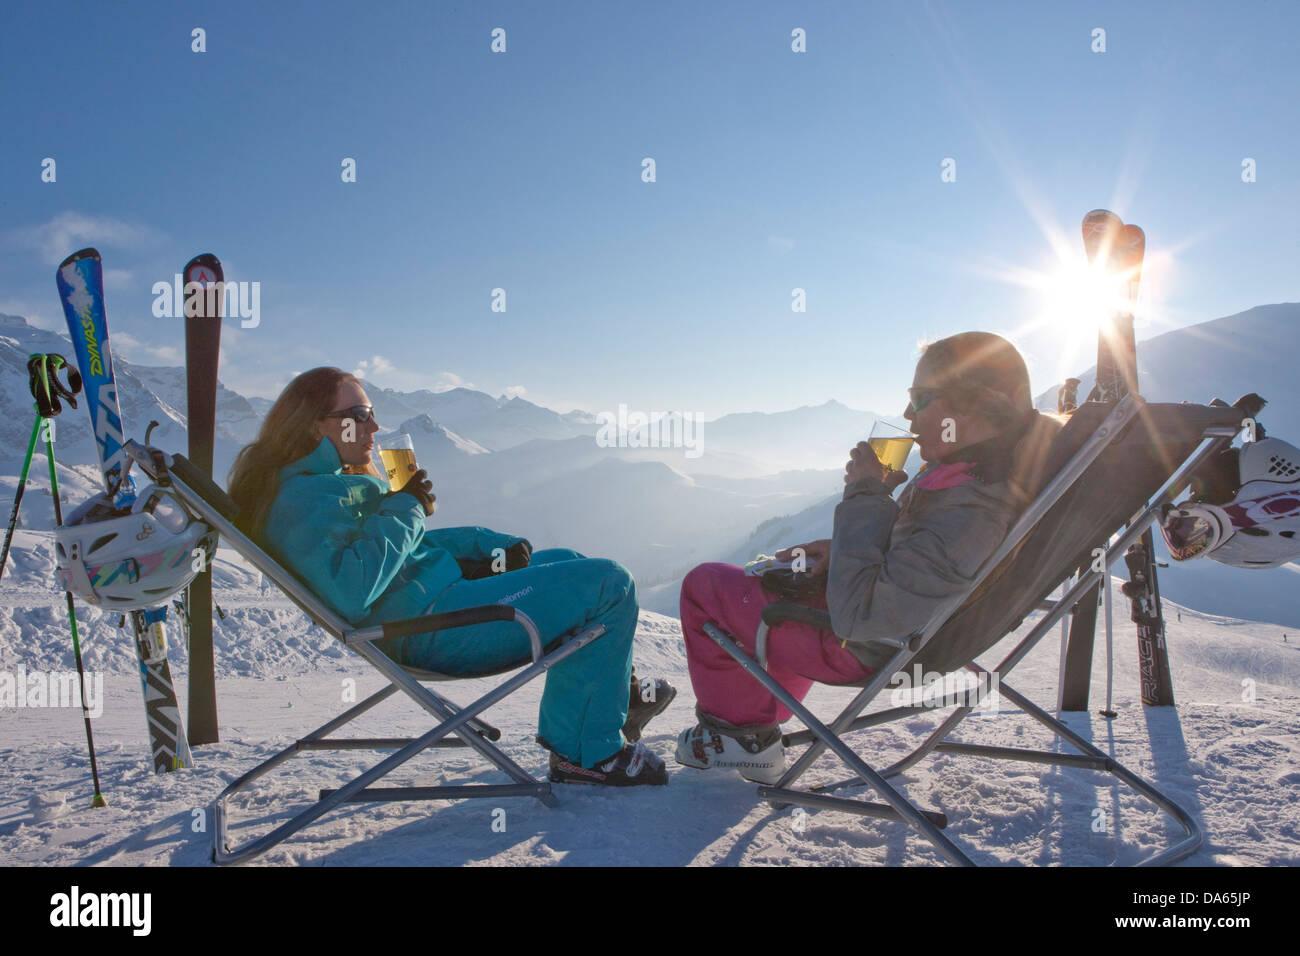 Break, Stop, deck chair, skiing area, Adelboden, winter, canton, Bern, Bernese Oberland, women, drinking, tourism, - Stock Image